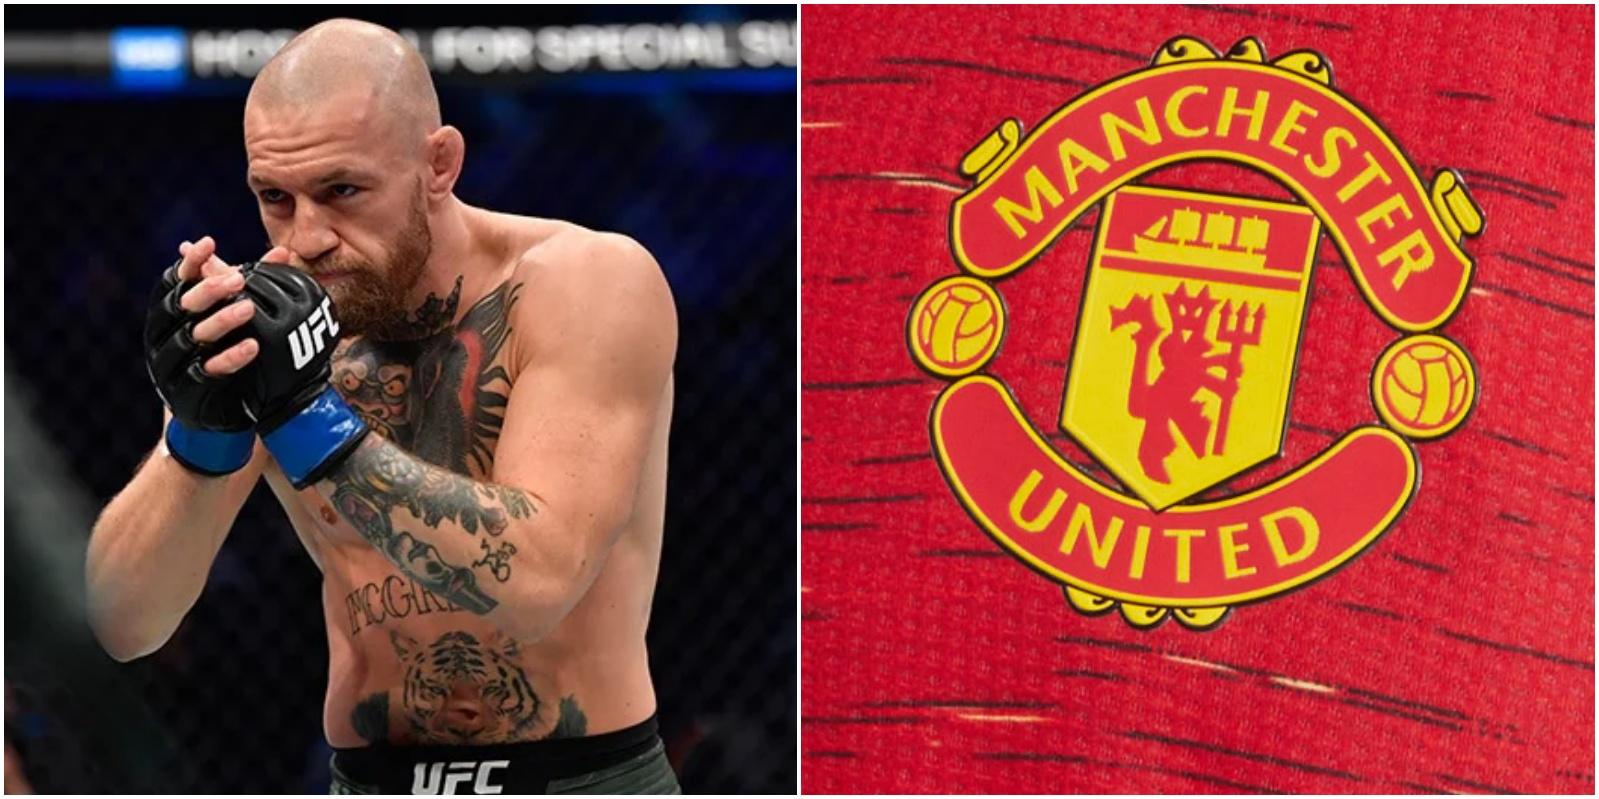 McGregor comprare united